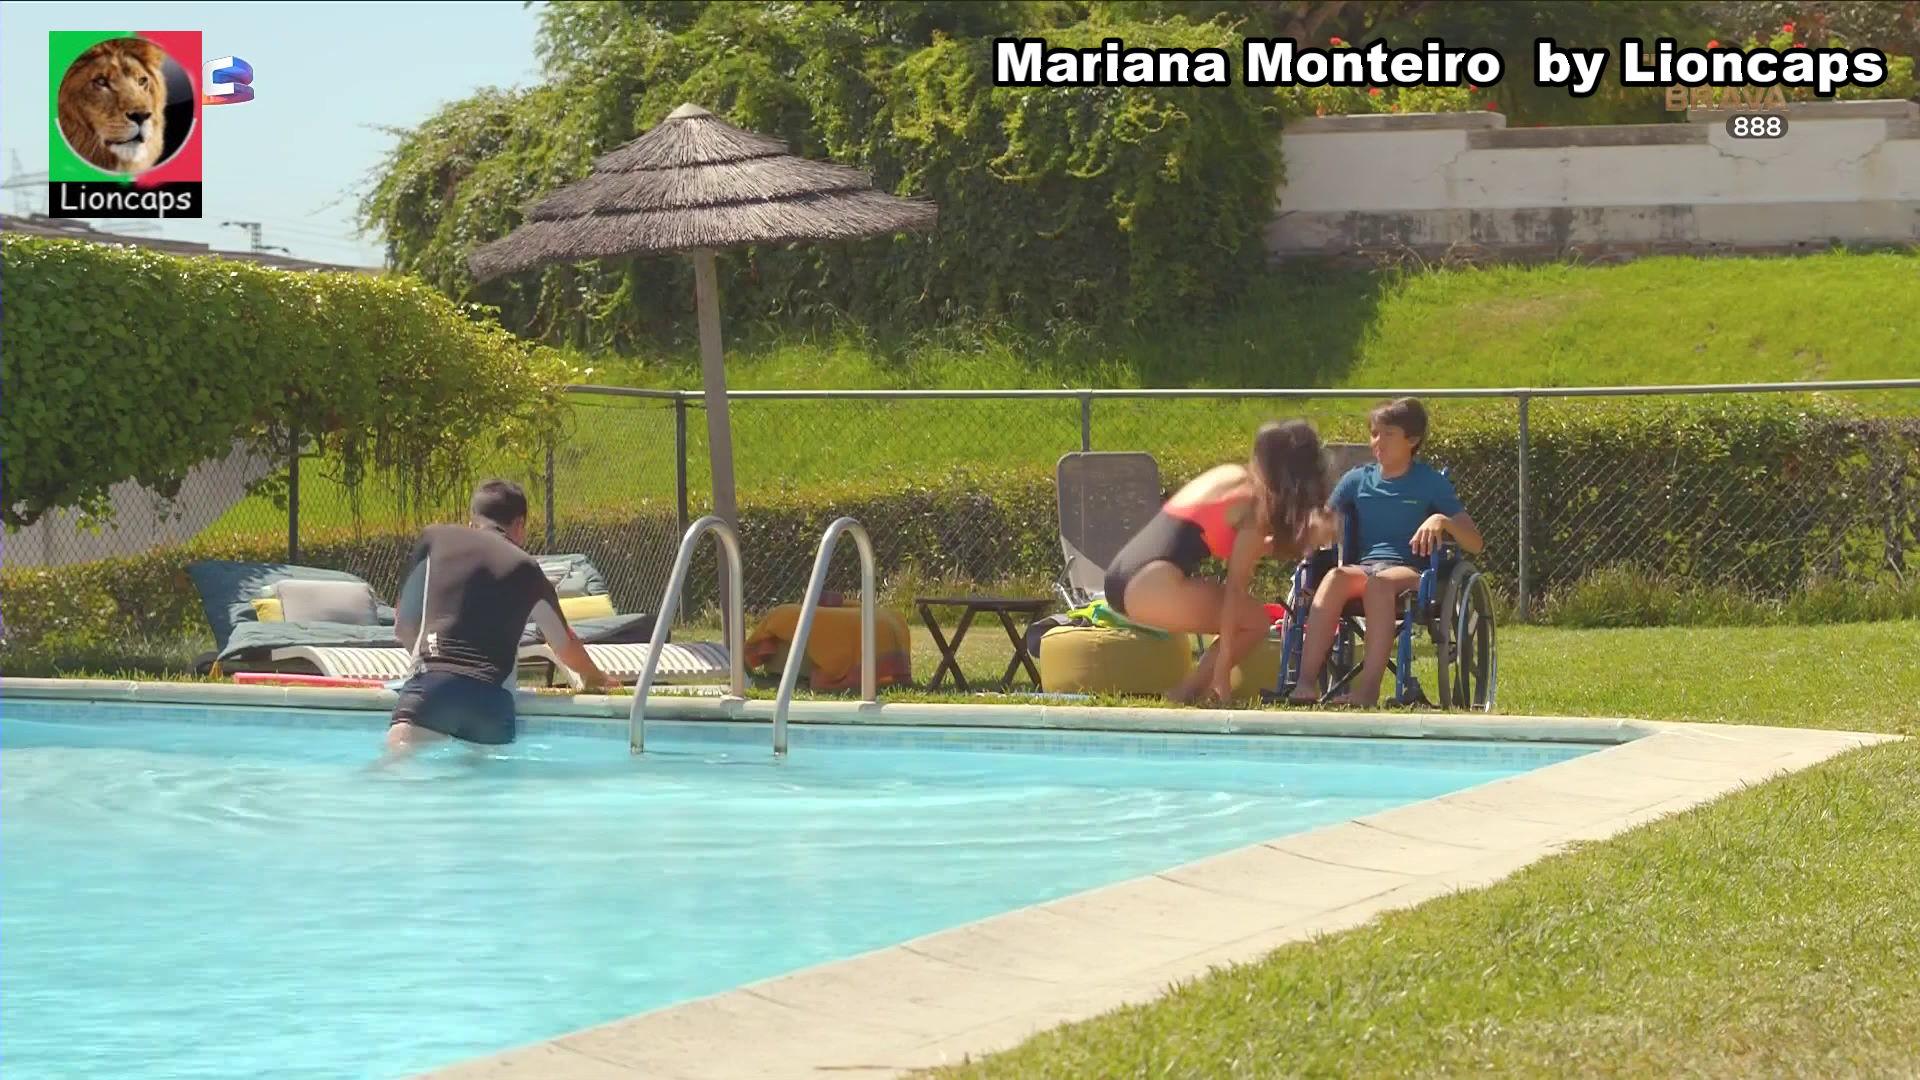 634940937_mariana_monteiro_vs191124_27110_122_433lo.JPG